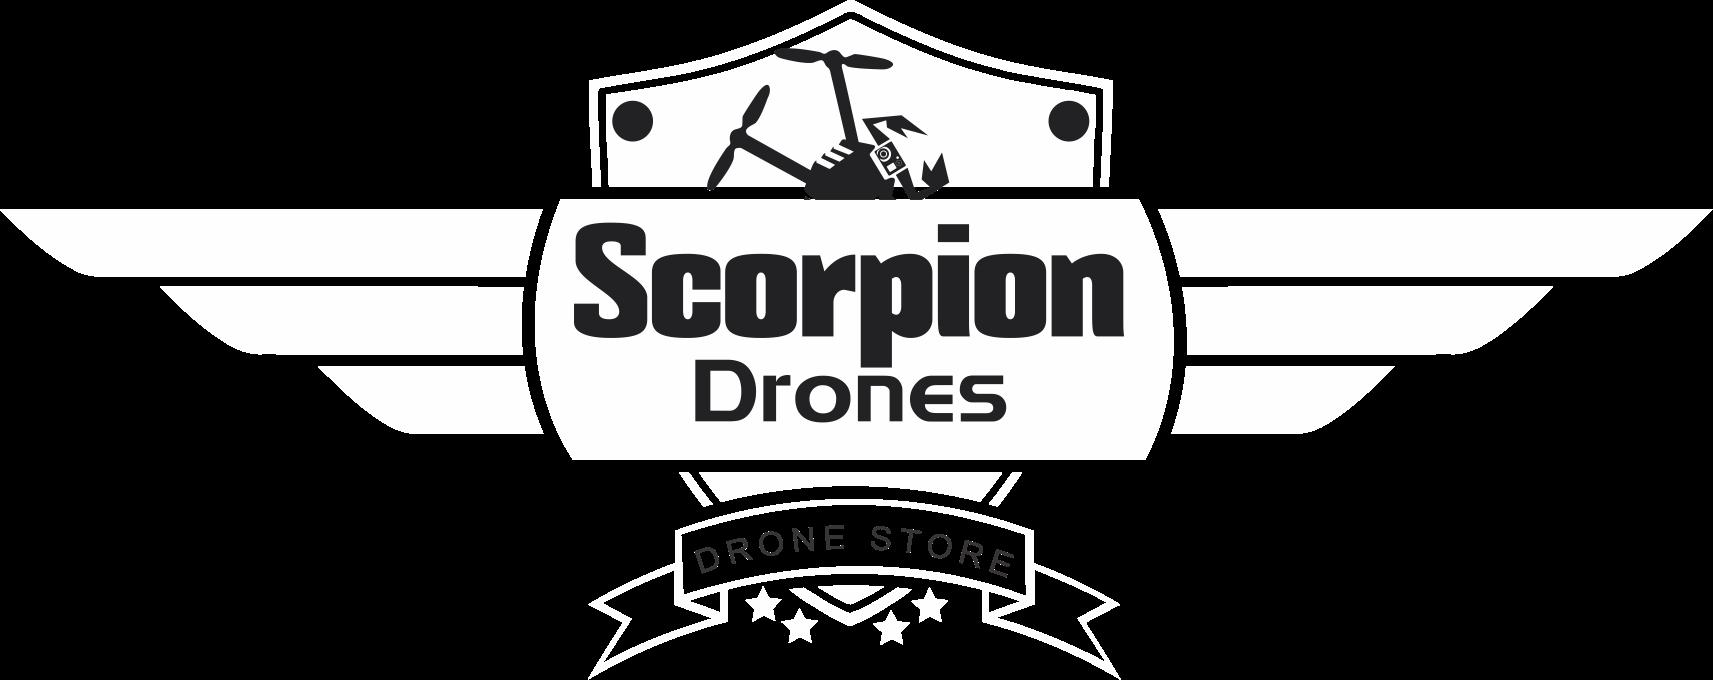 SCORPION DRONES